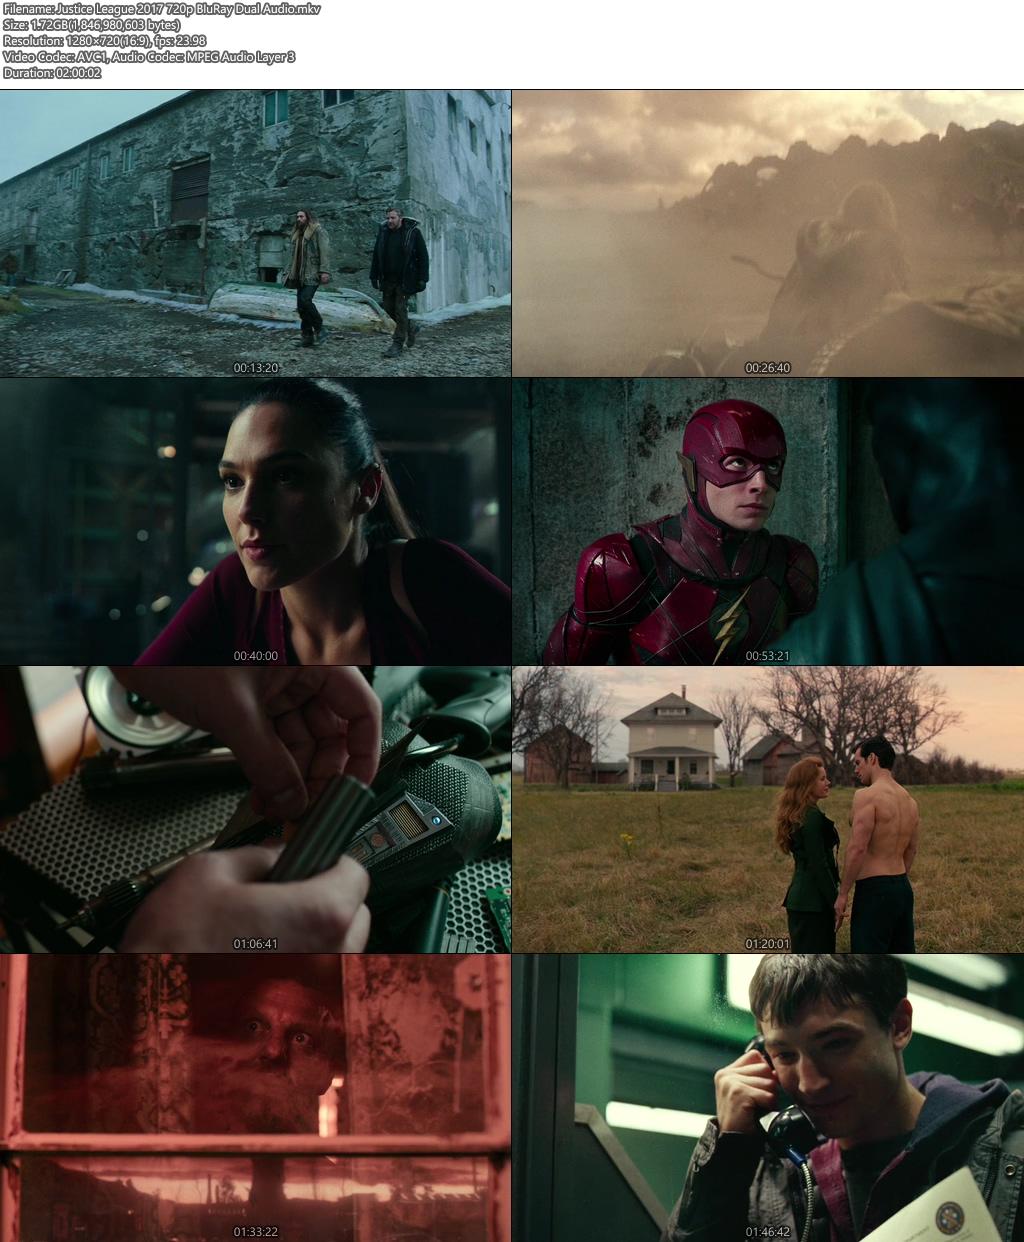 Justice League 2017 720p BluRay Dual Audio 720p | 400MB 480p | 200MB HEVC Screenshot